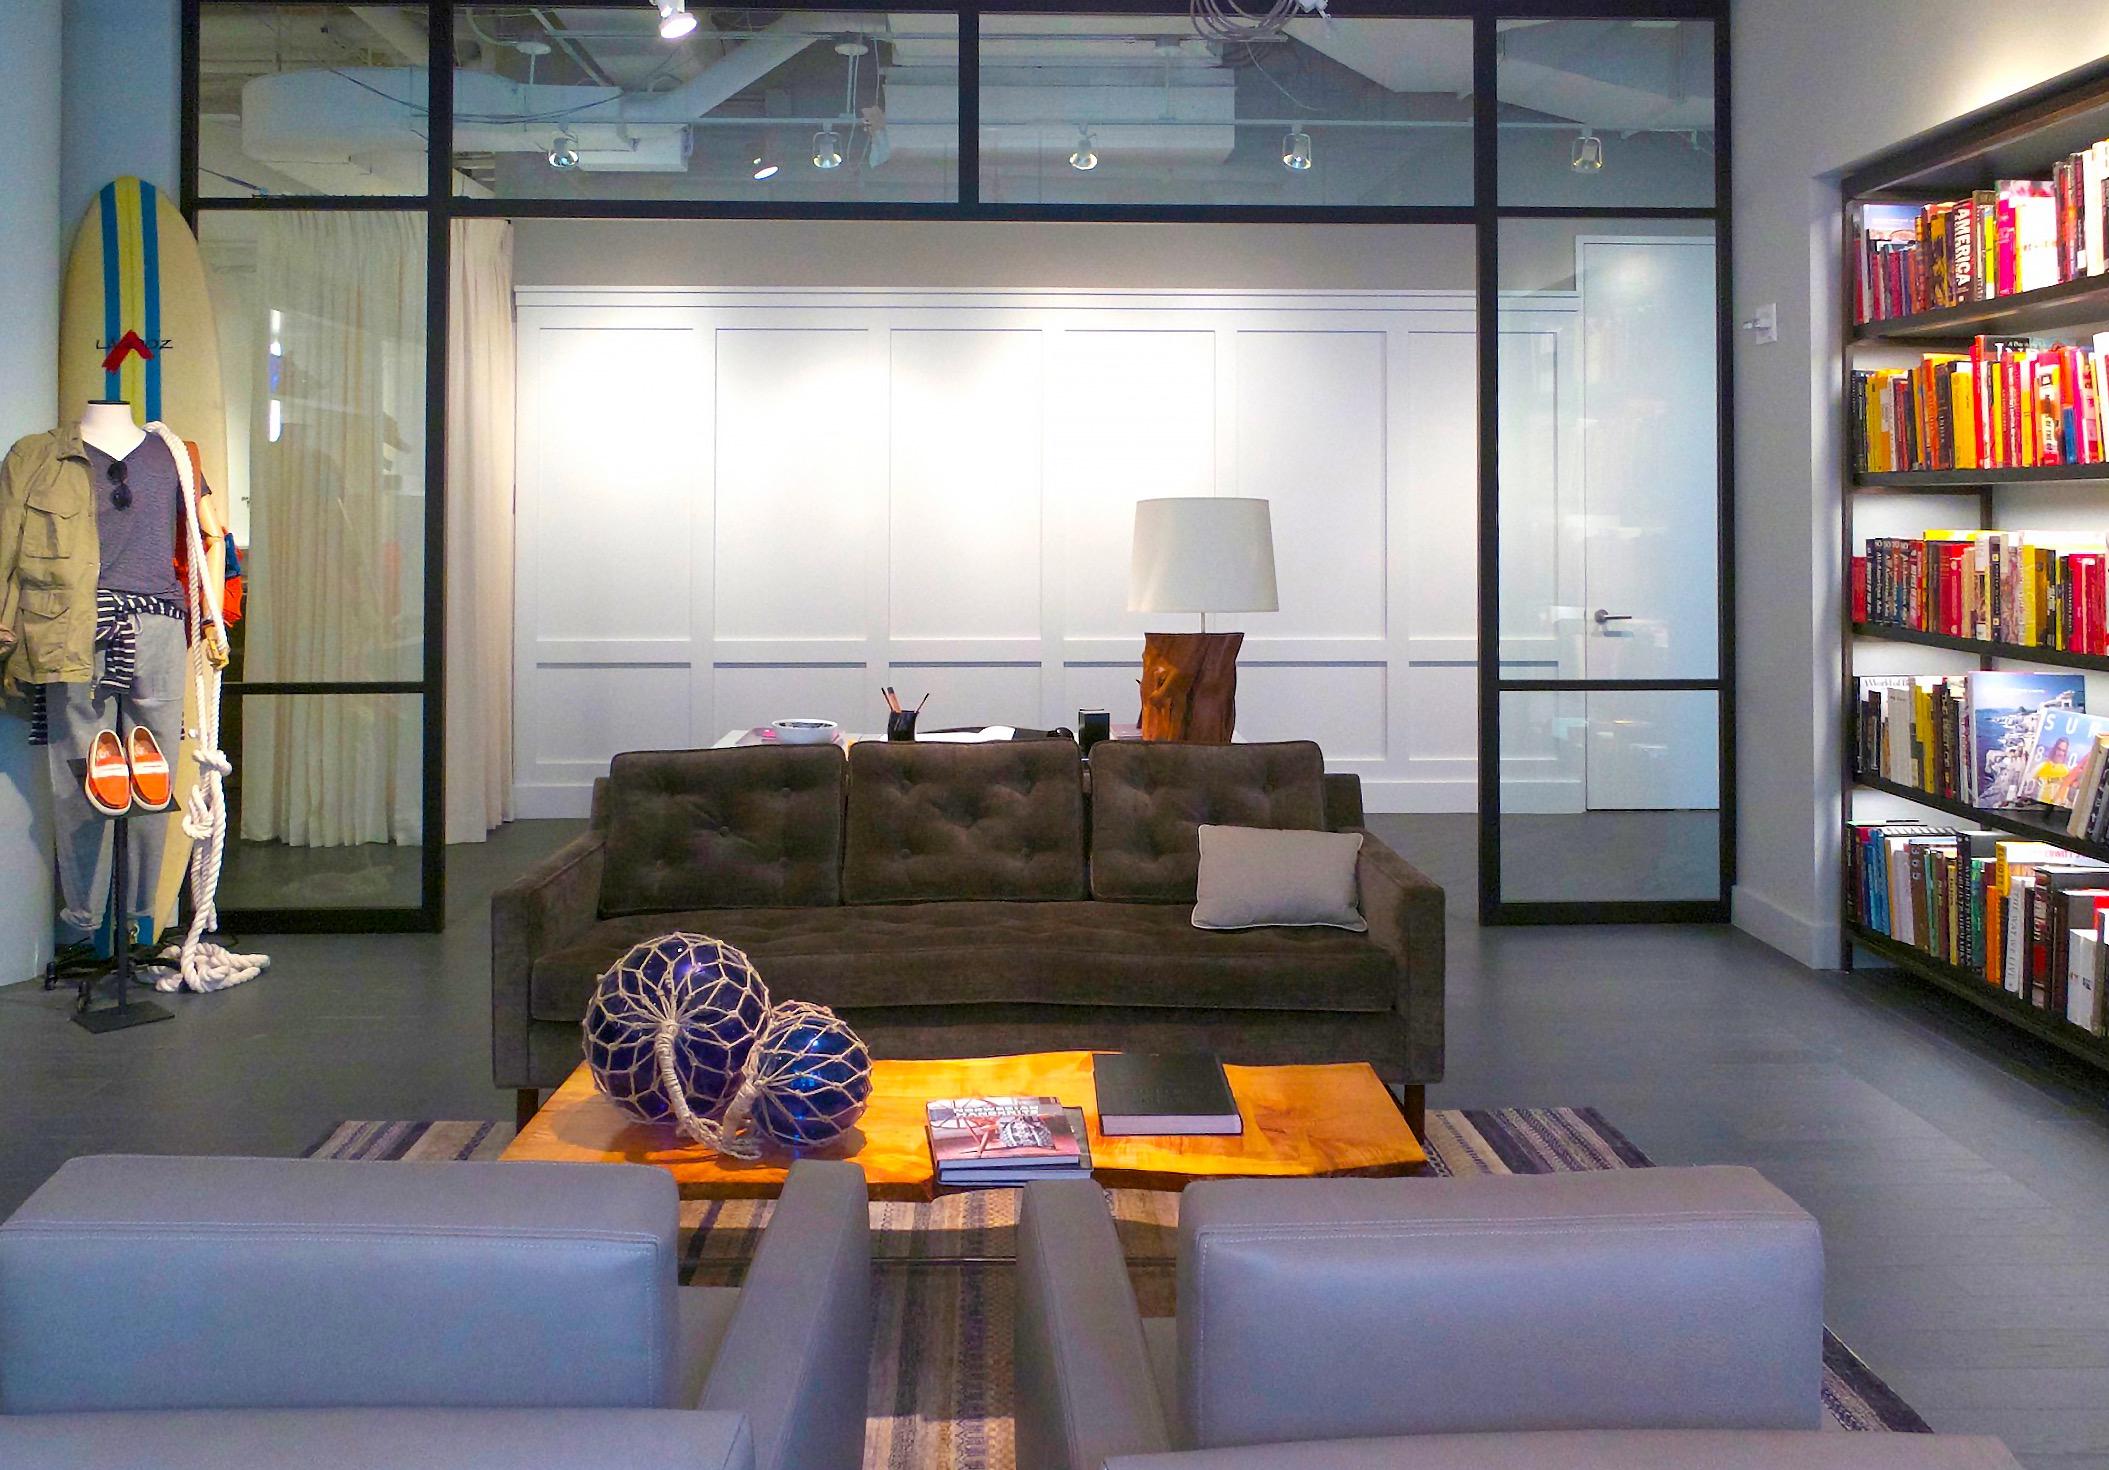 Library-sofa copy.jpg